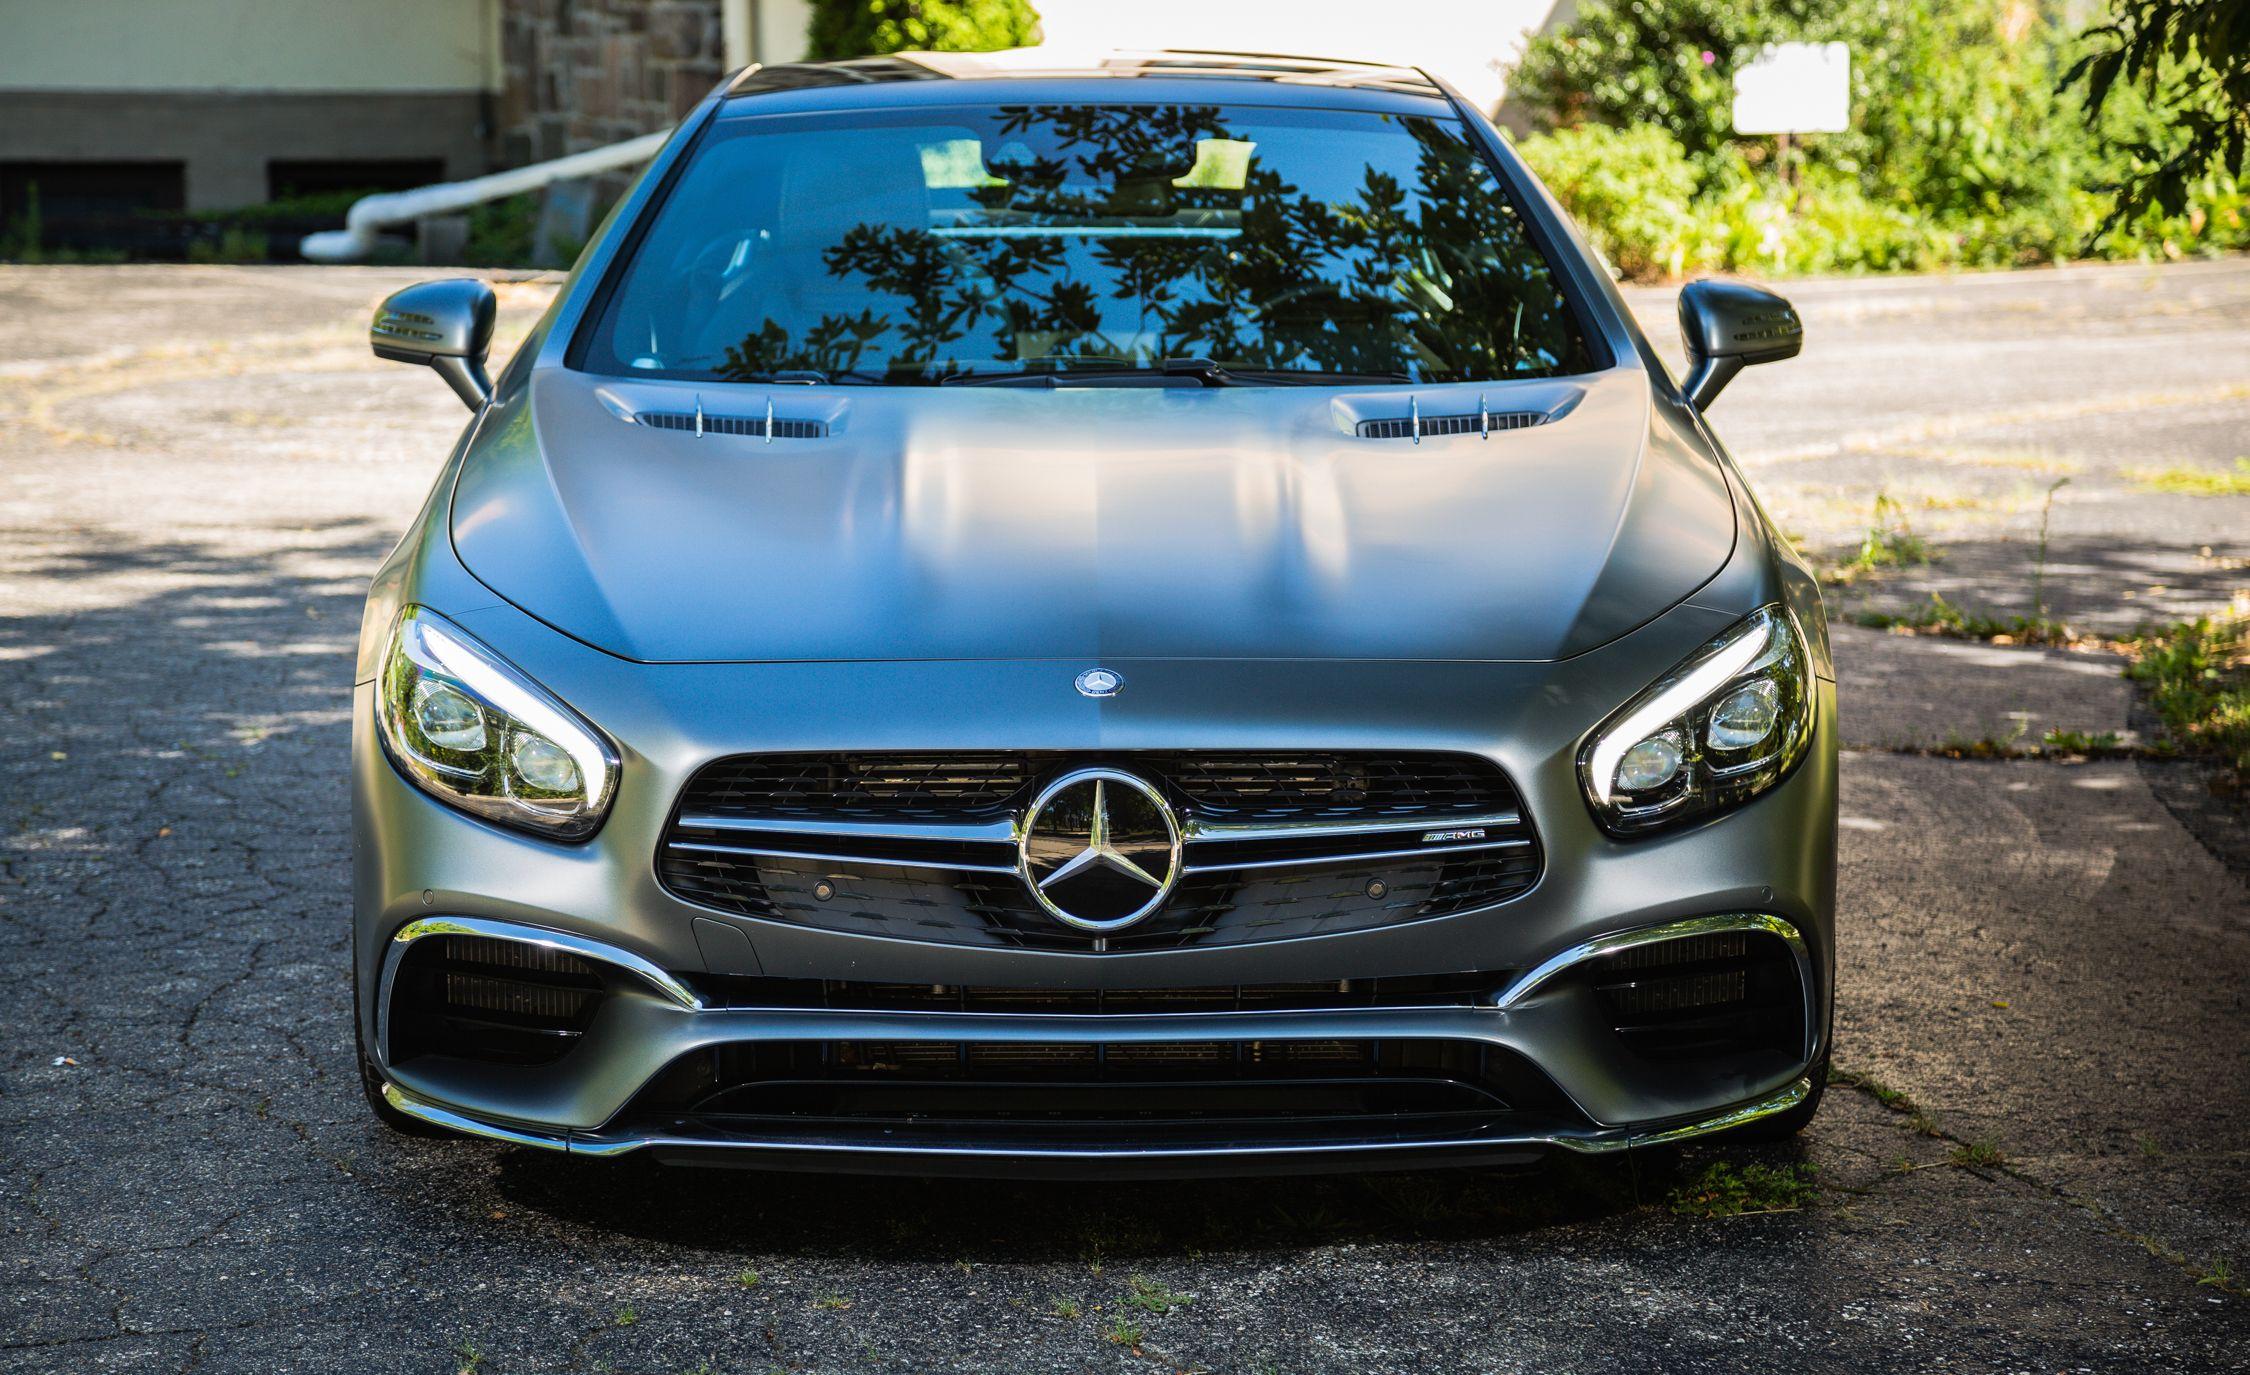 https://hips.hearstapps.com/amv-prod-cad-assets.s3.amazonaws.com/wp-content/uploads/2016/08/2017-Mercedes-AMG-SL65-117.jpg